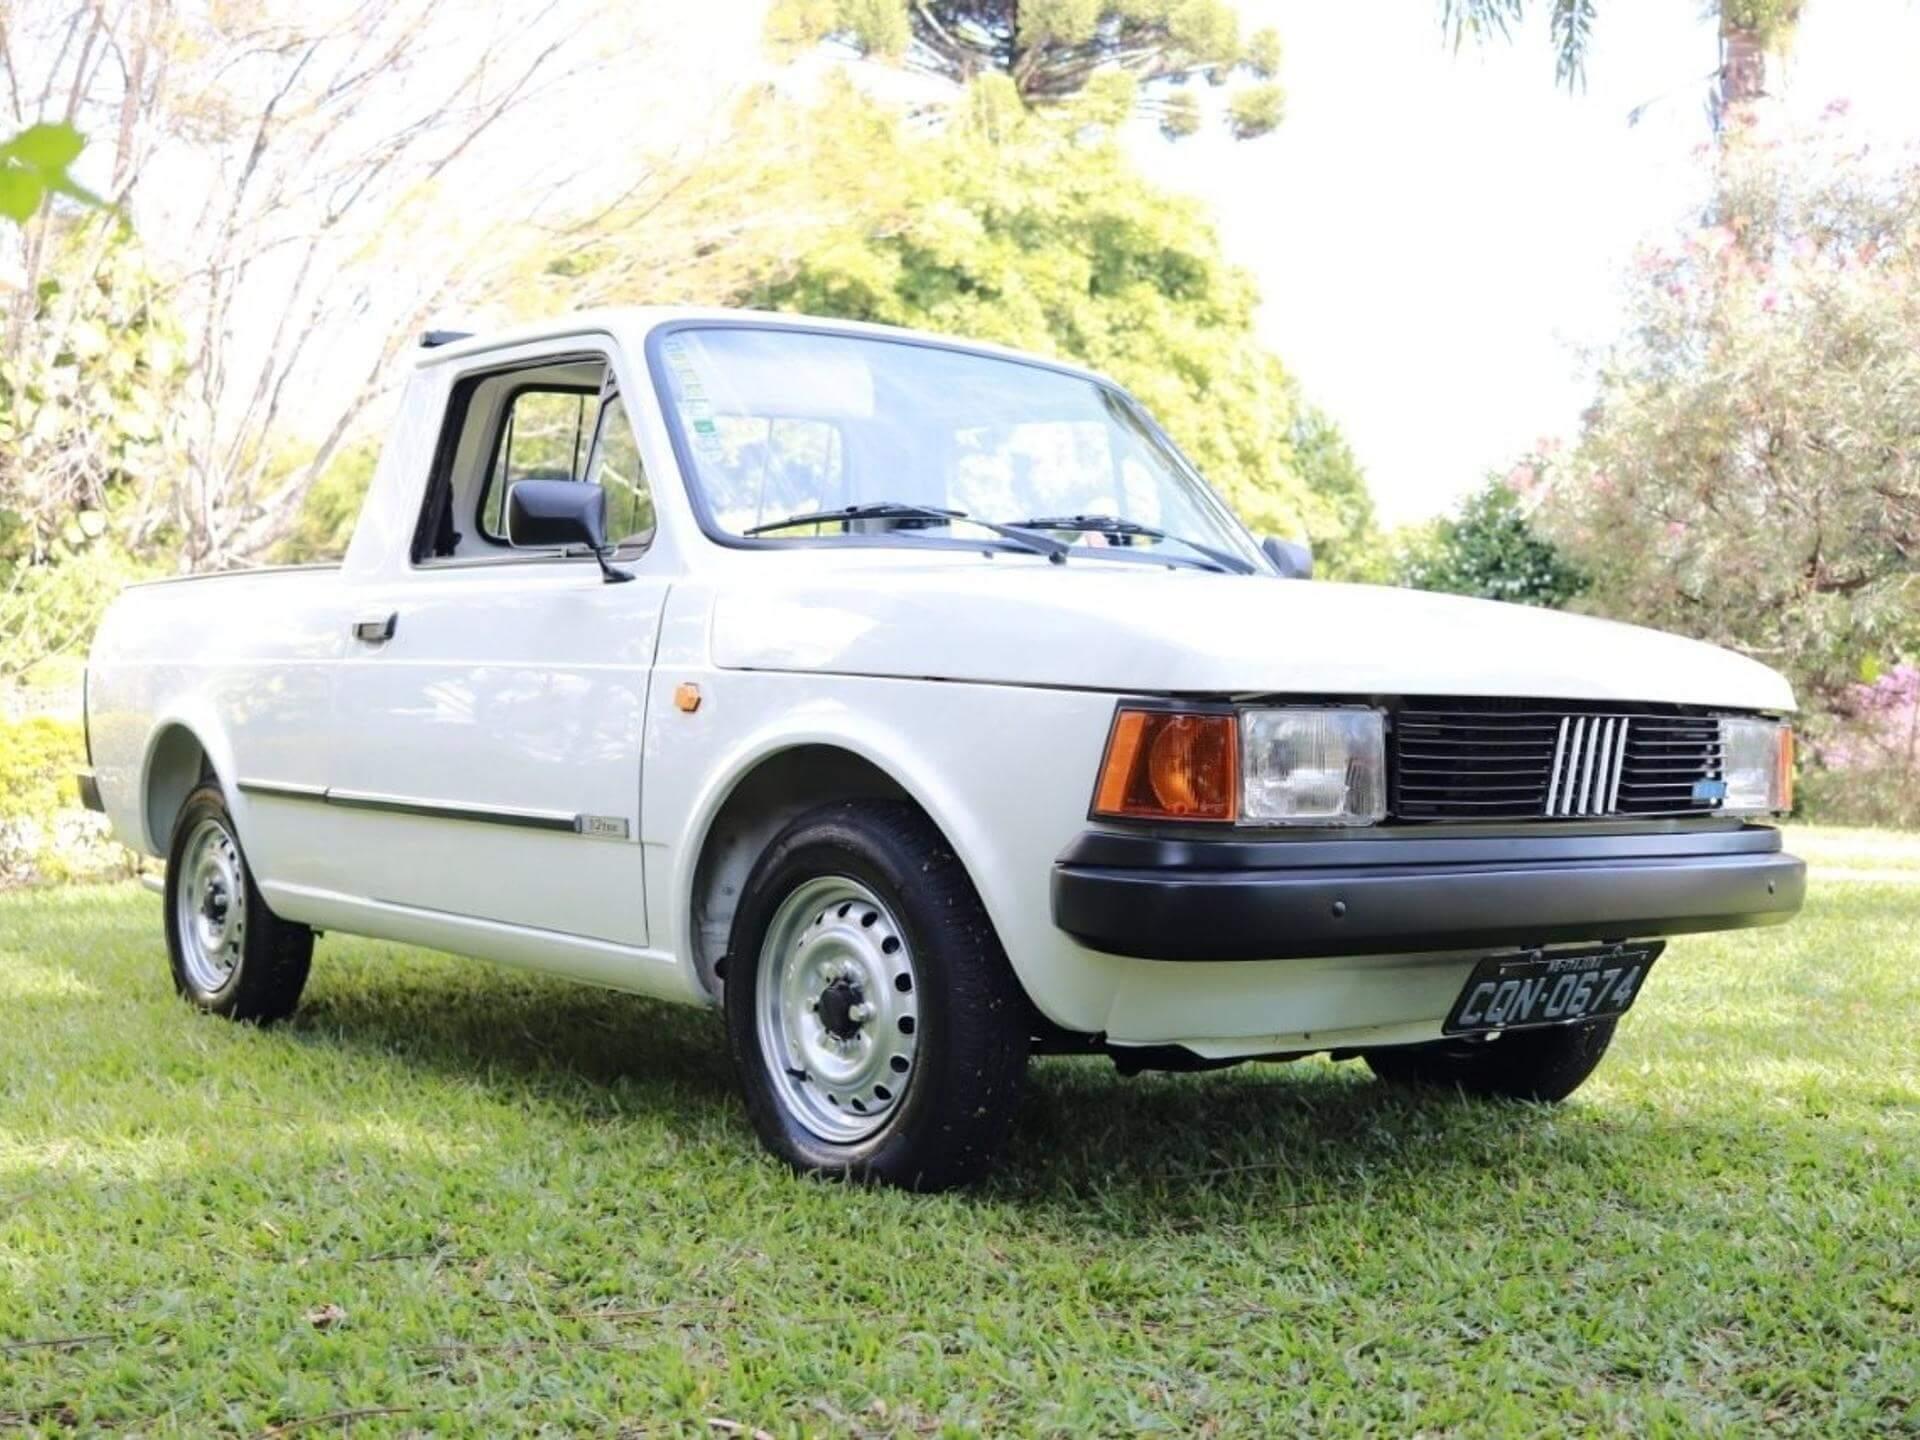 Fiat 147 1.3 Pickup City Cs 8v Alcool 2p Manual Wmimagem19062698042